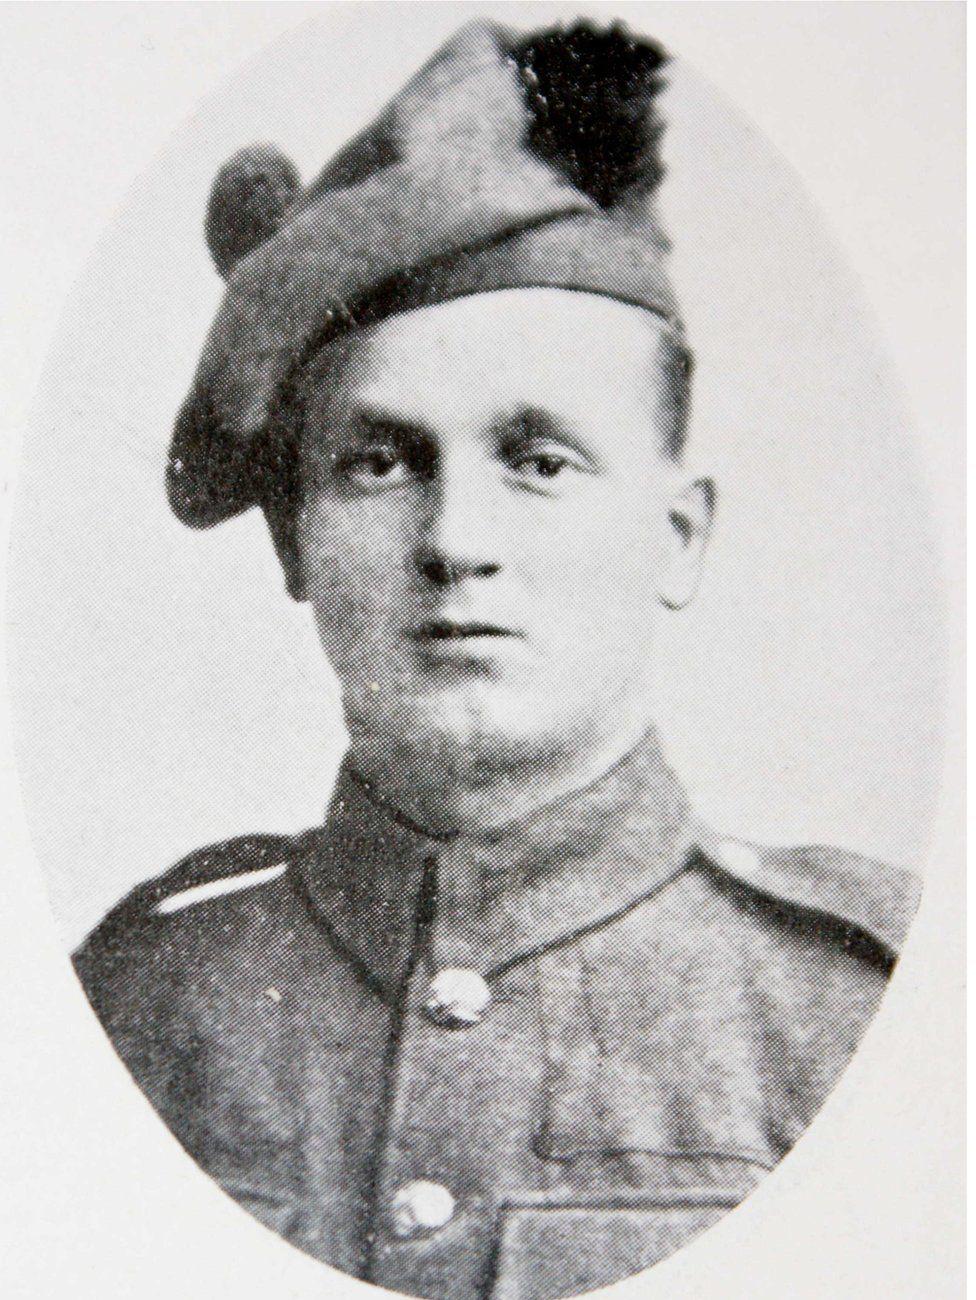 Private Andrew Webb